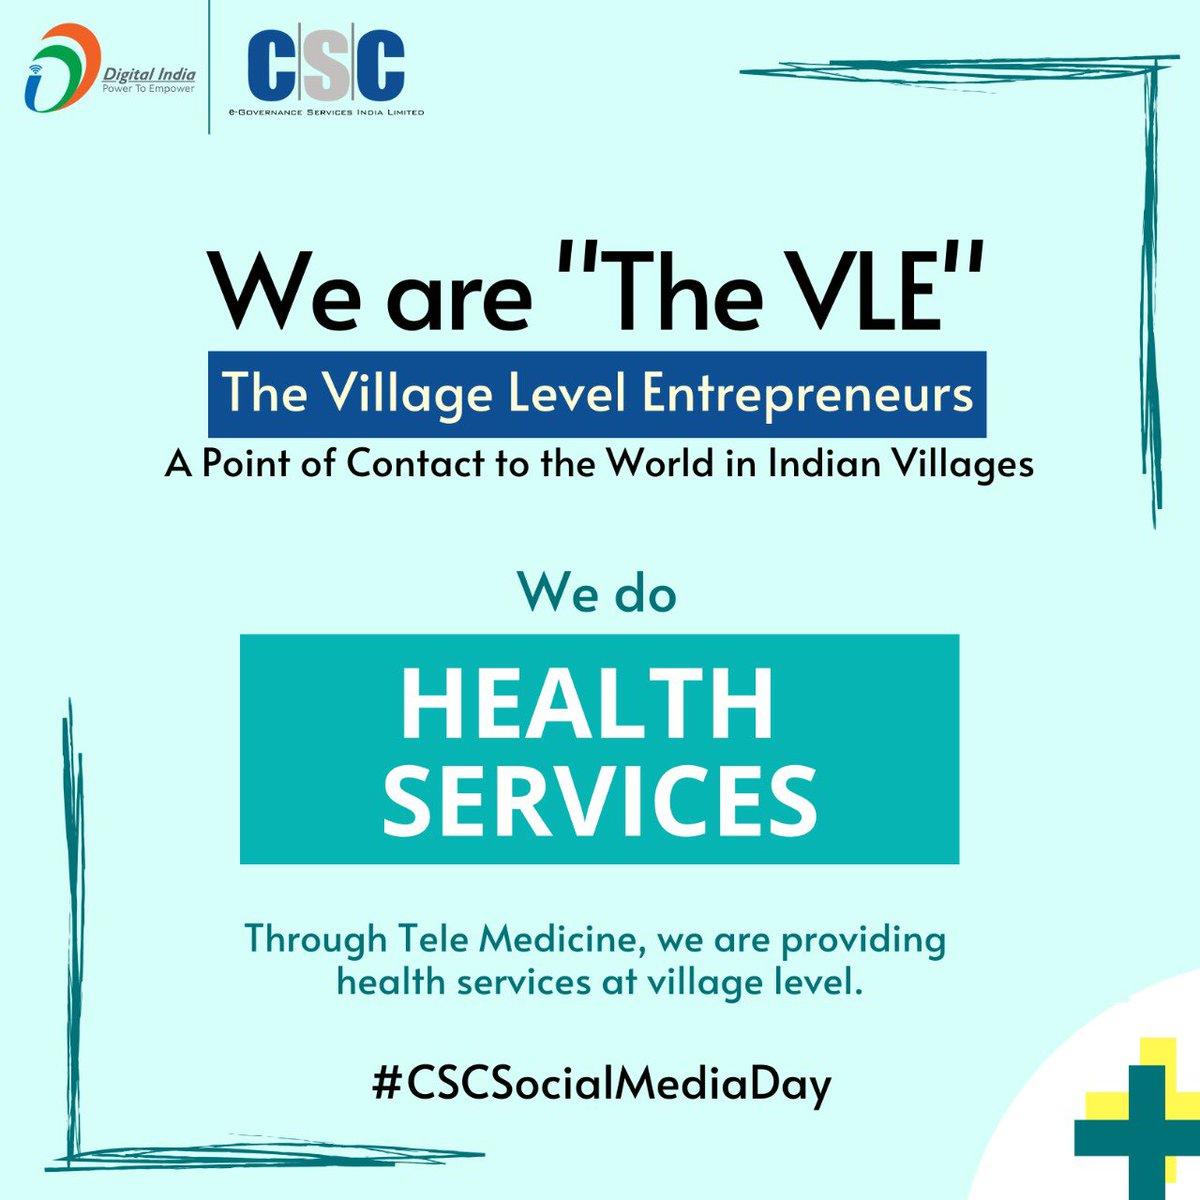 Every CSC is a digital doctor #CSCSocialMediaDay